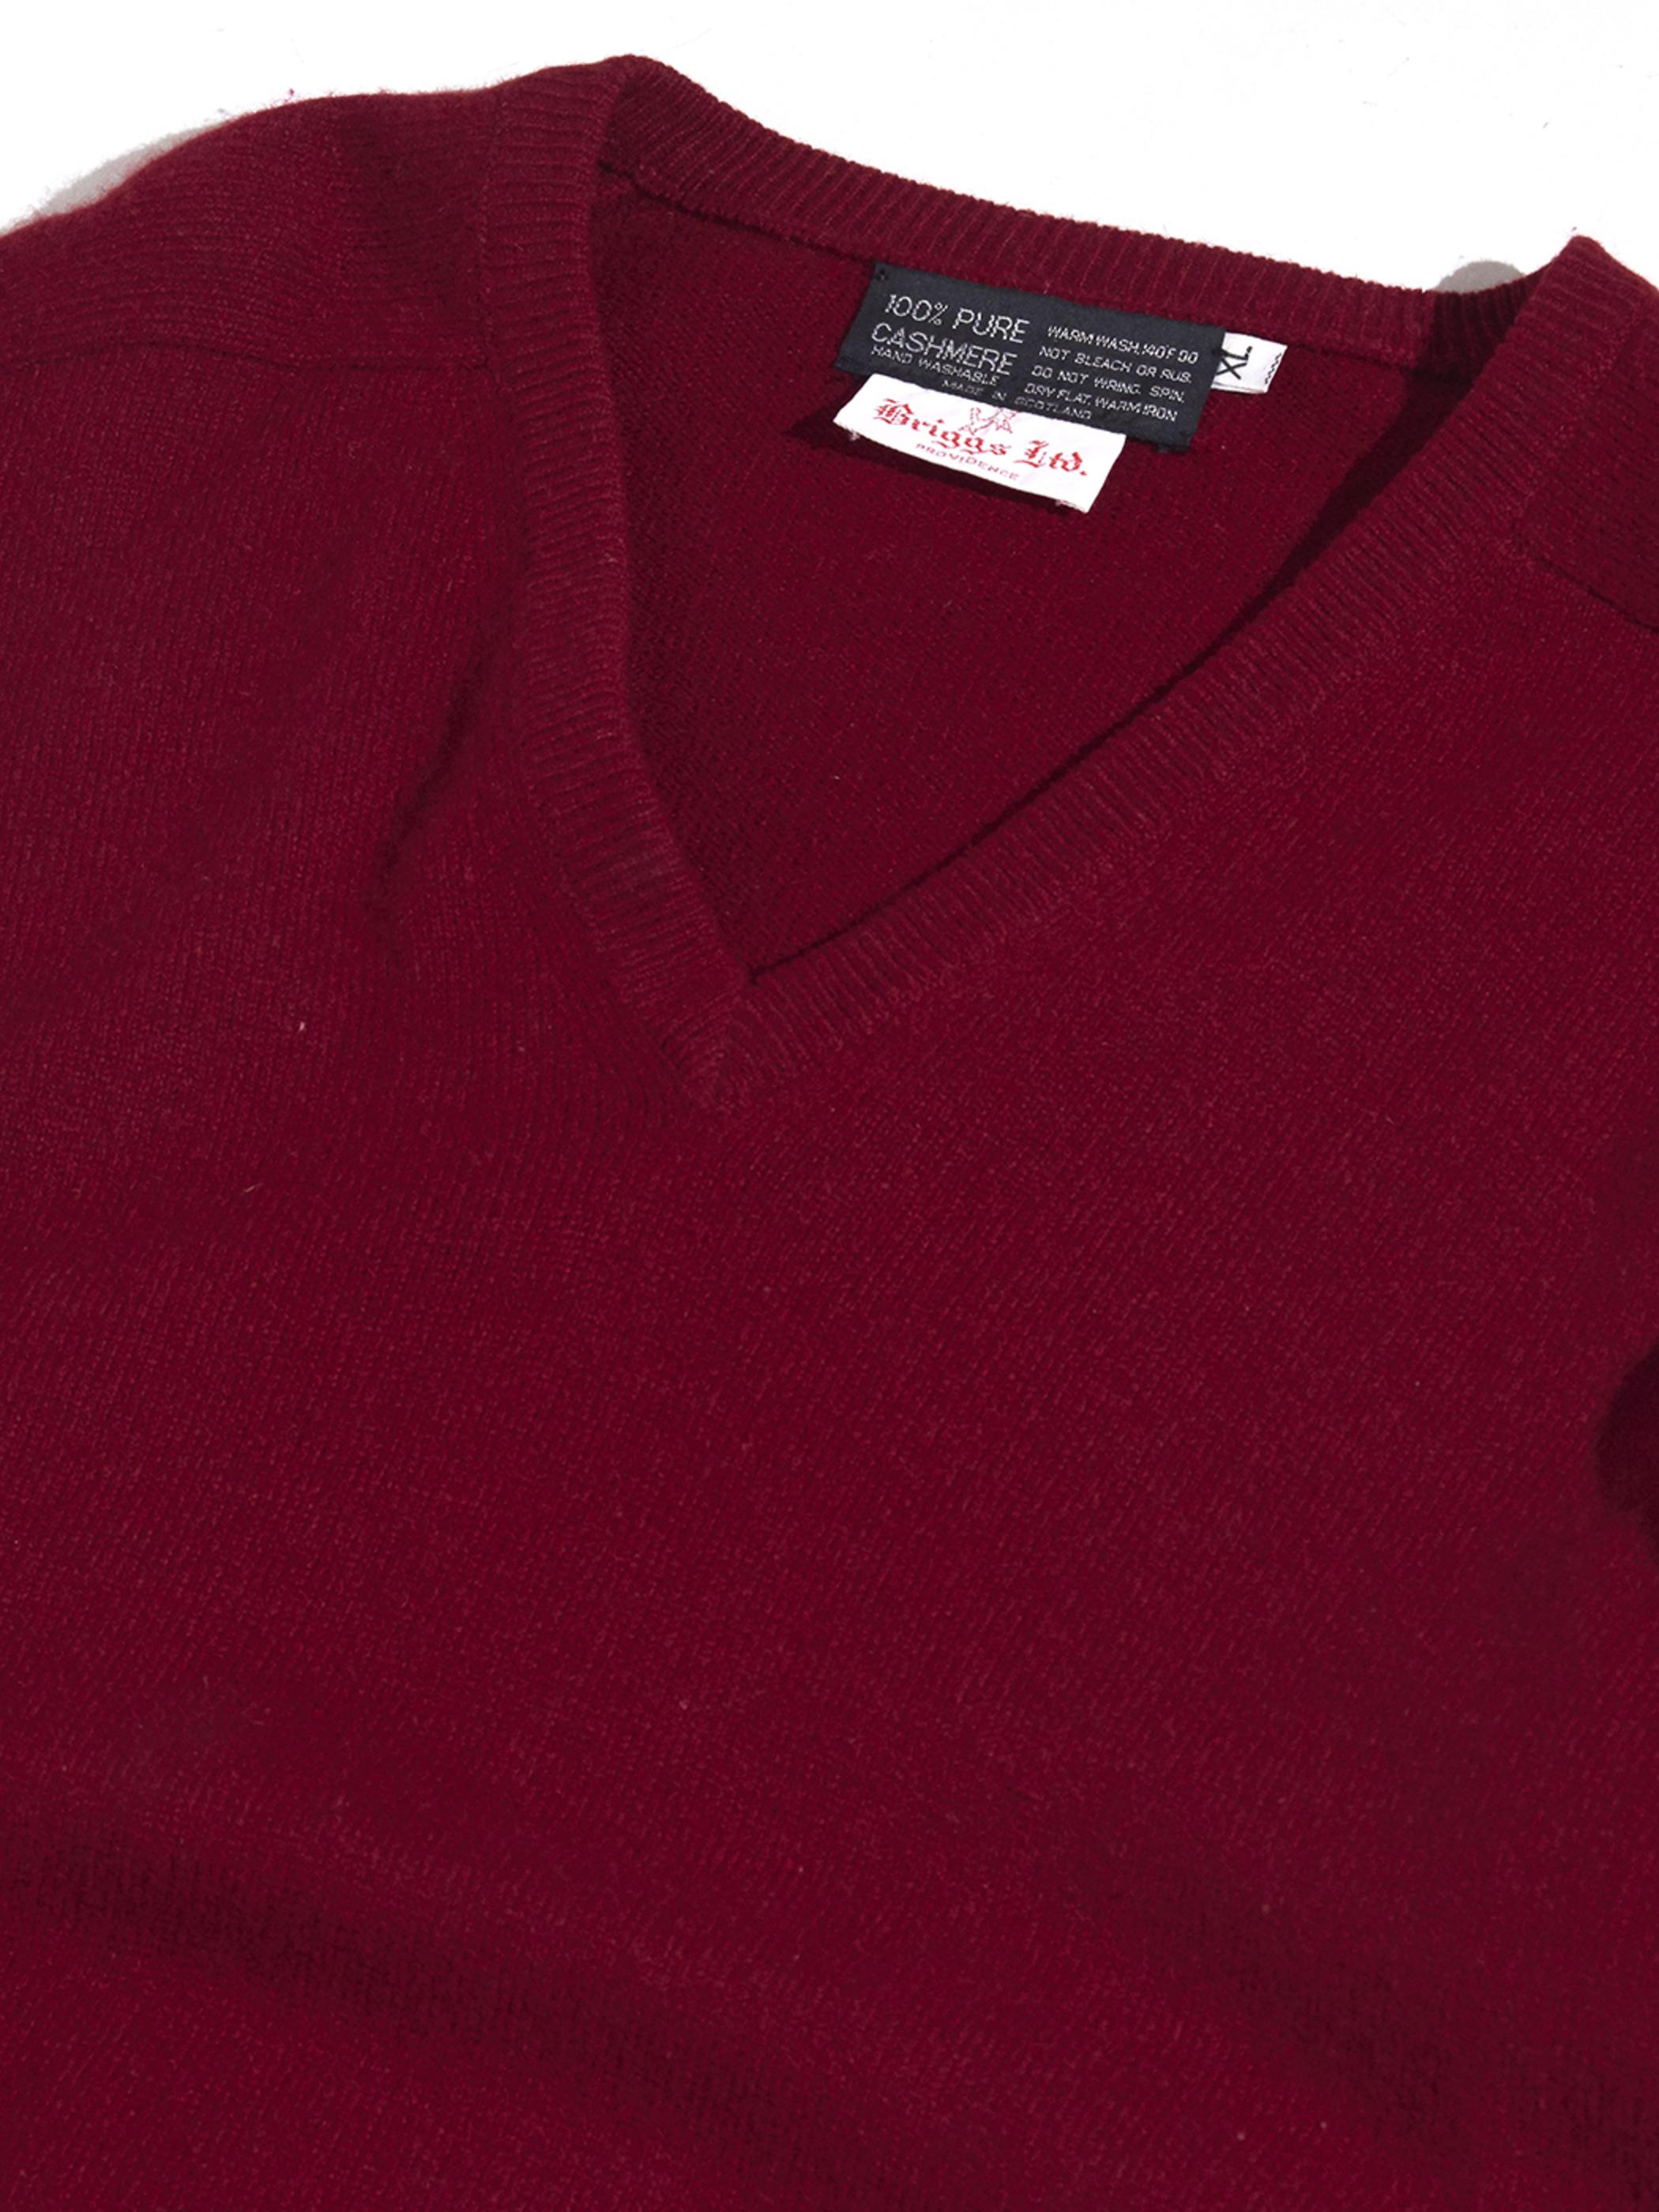 "1960s ""Briggs Ltd."" v-neck cashmere knit -MARRON-"